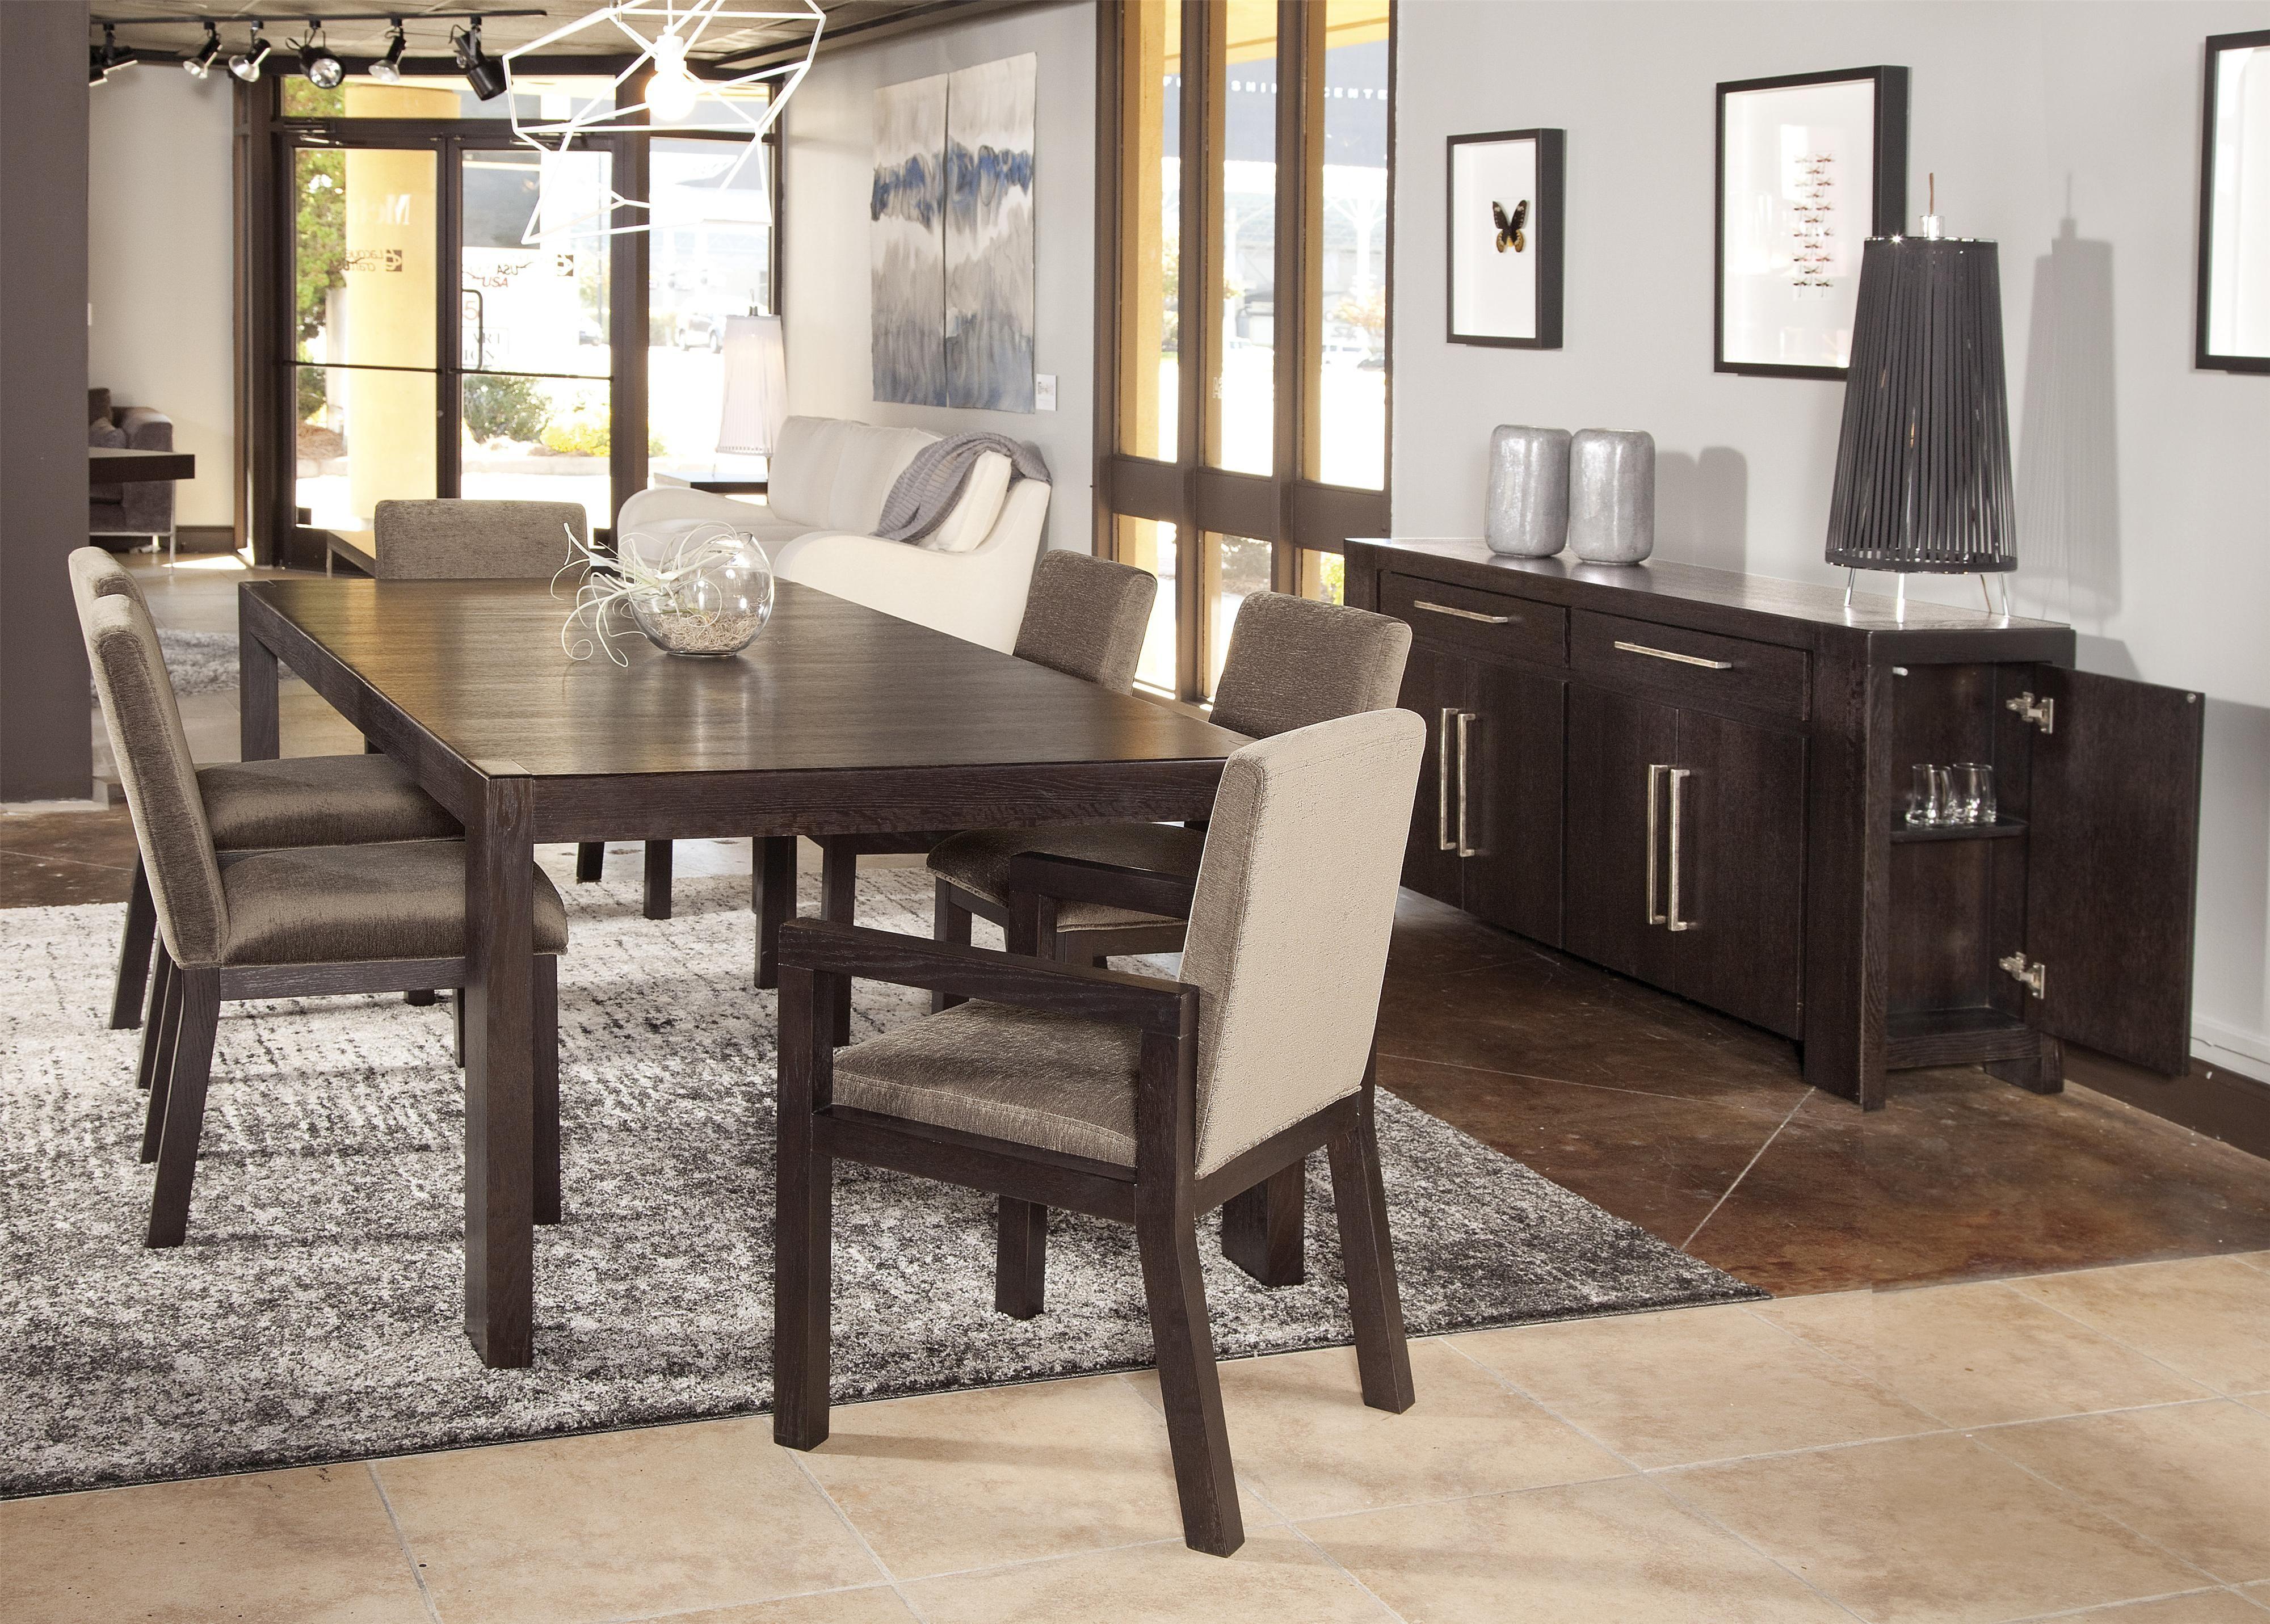 Lacquer Craft Usa Metropolitan 8300 7 Piece Casual Dining Table